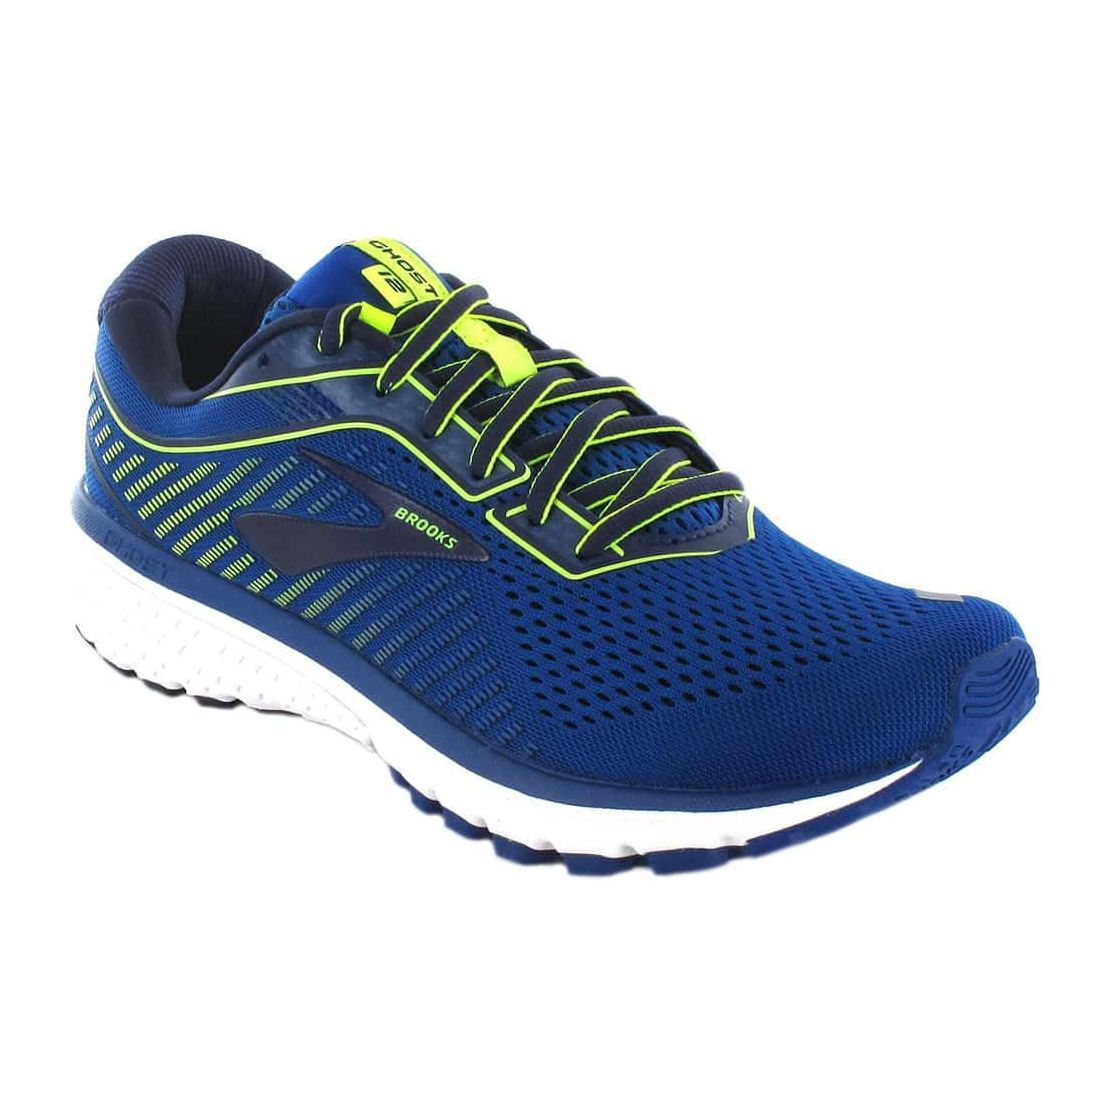 Brooks Ghost 12 Azul Brooks Zapatillas Running Hombre Zapatillas Running Tallas: 42, 42,5, 43, 44, 44,5, 45; Color: azul